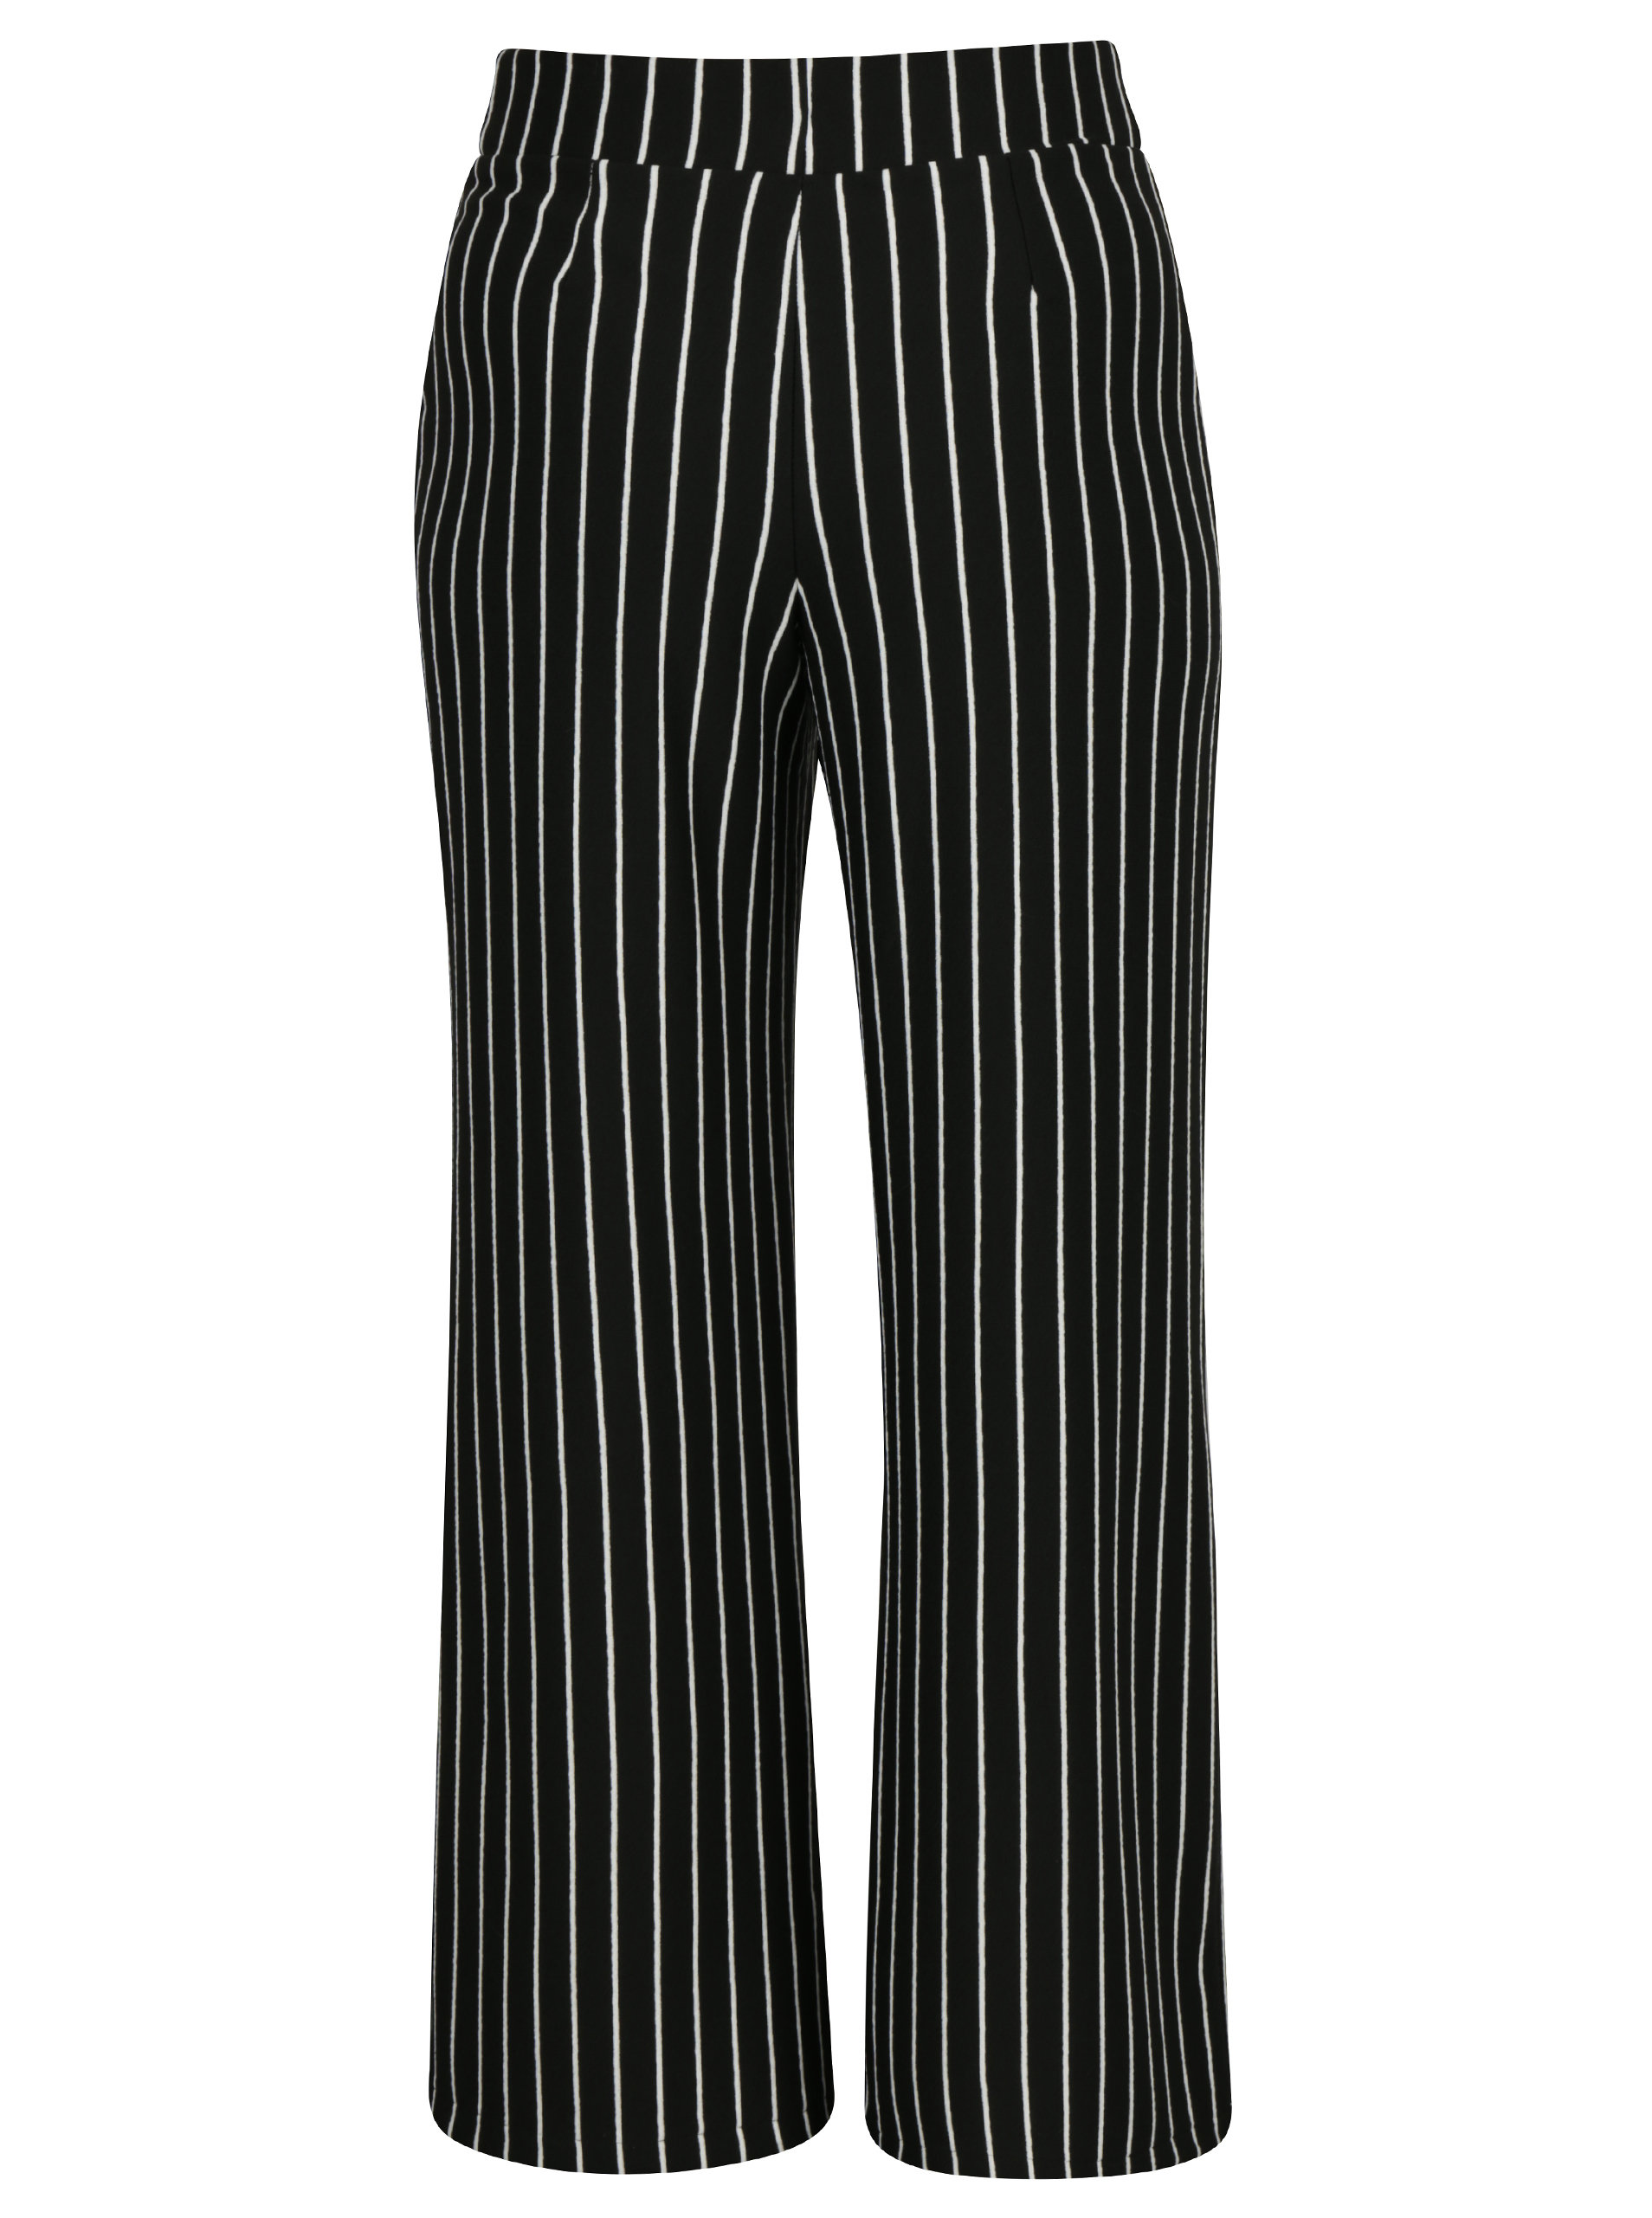 a8faec34b287 Čierno-biele pruhované nohavice Miss Selfridge Petites ...